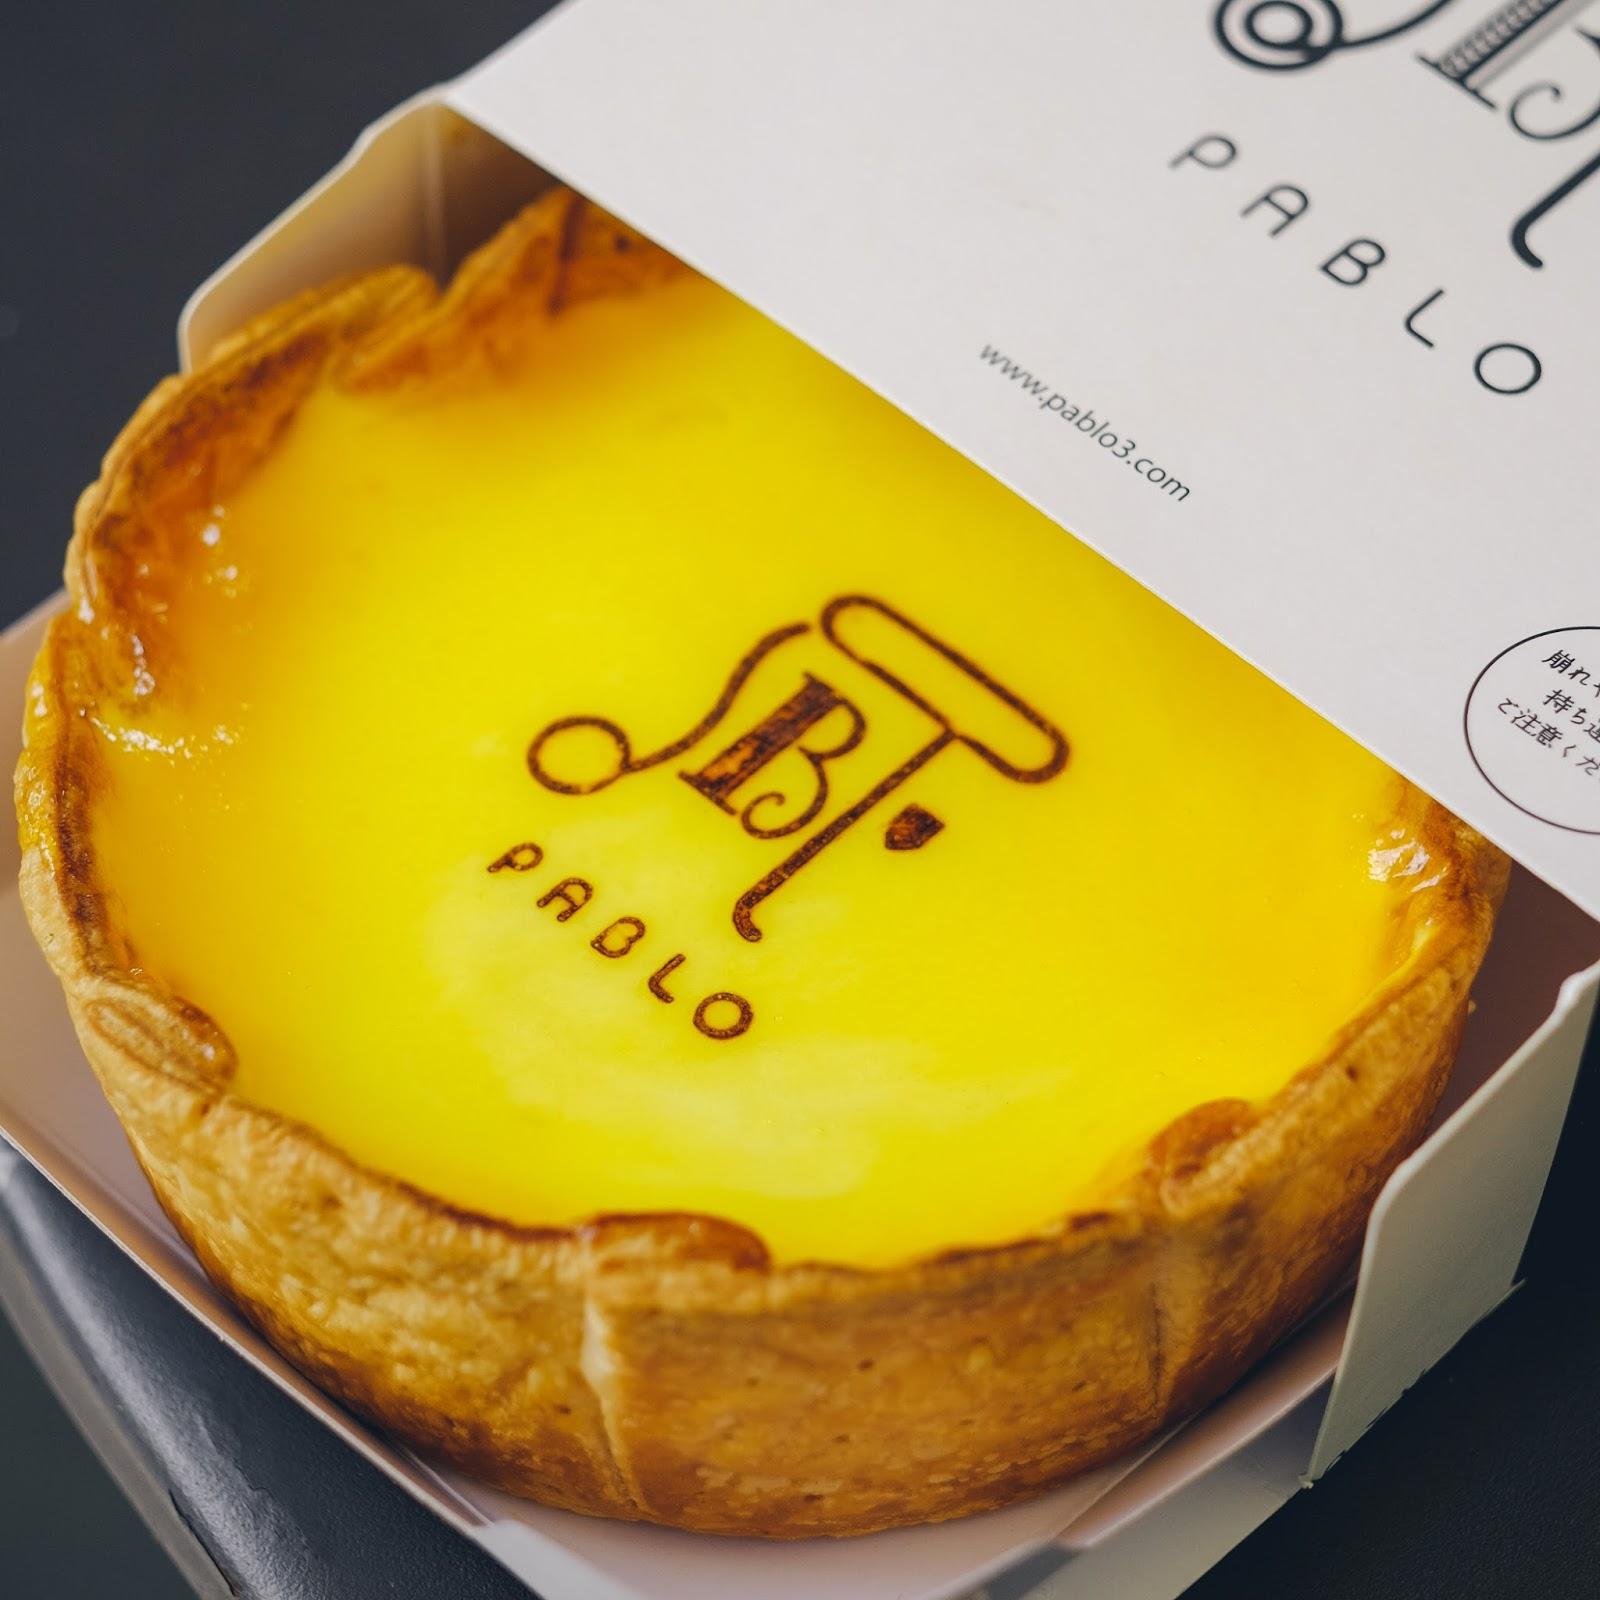 Pablo Cheese Tart Indonesia Gandaria City Jakarta First Preview Eatandtreats Indonesian